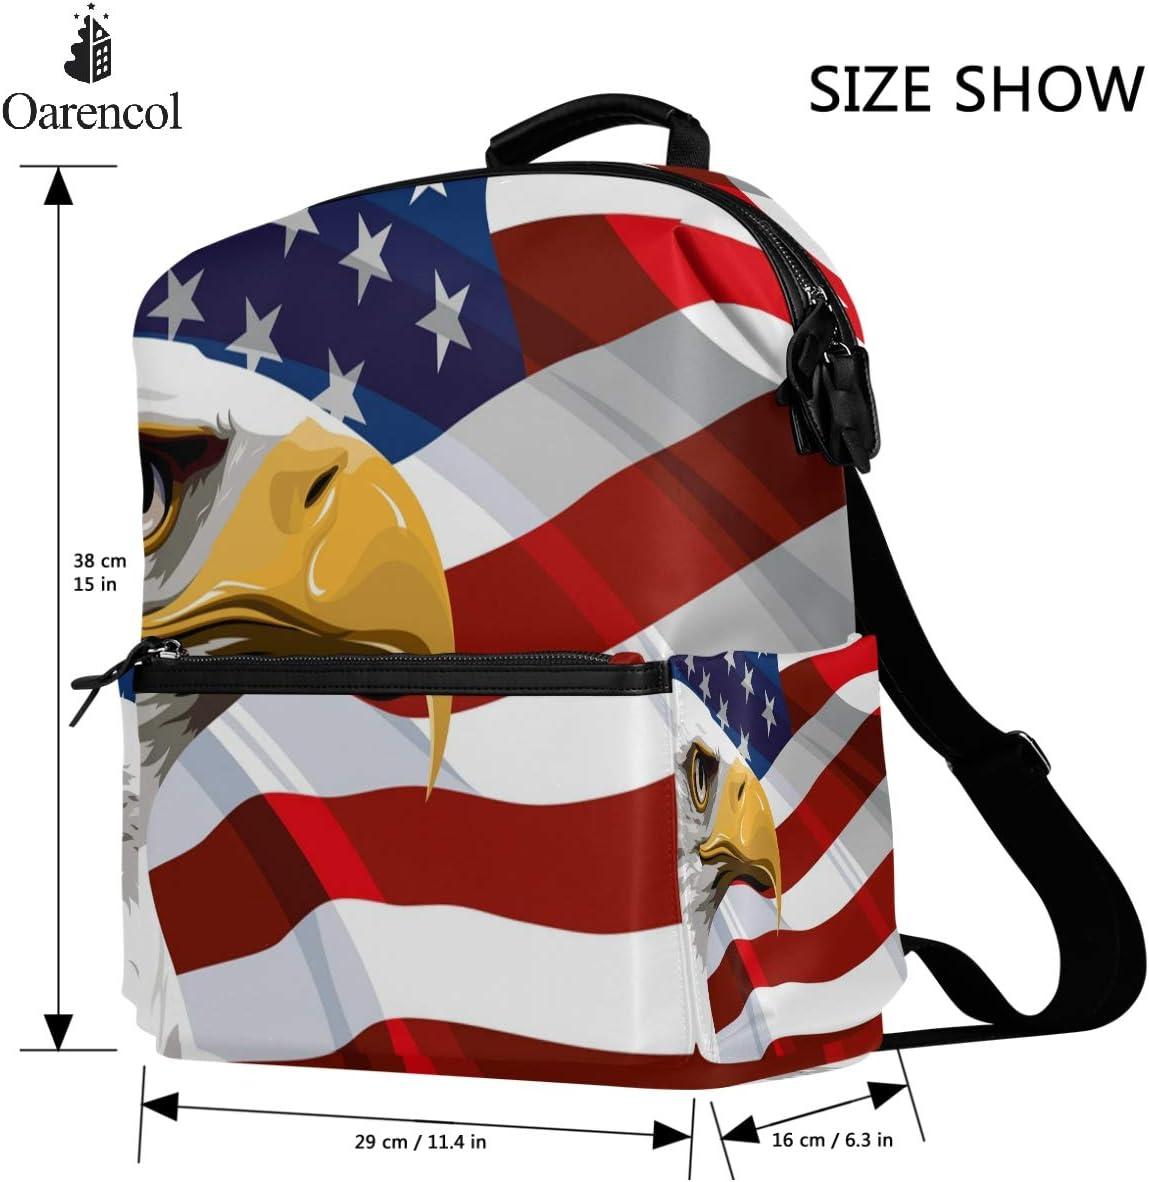 Oarencol Vintage Bald Vulture American Flag Backpack USA Patriotic School Book Bag Travel Hiking Camping Laptop Daypack